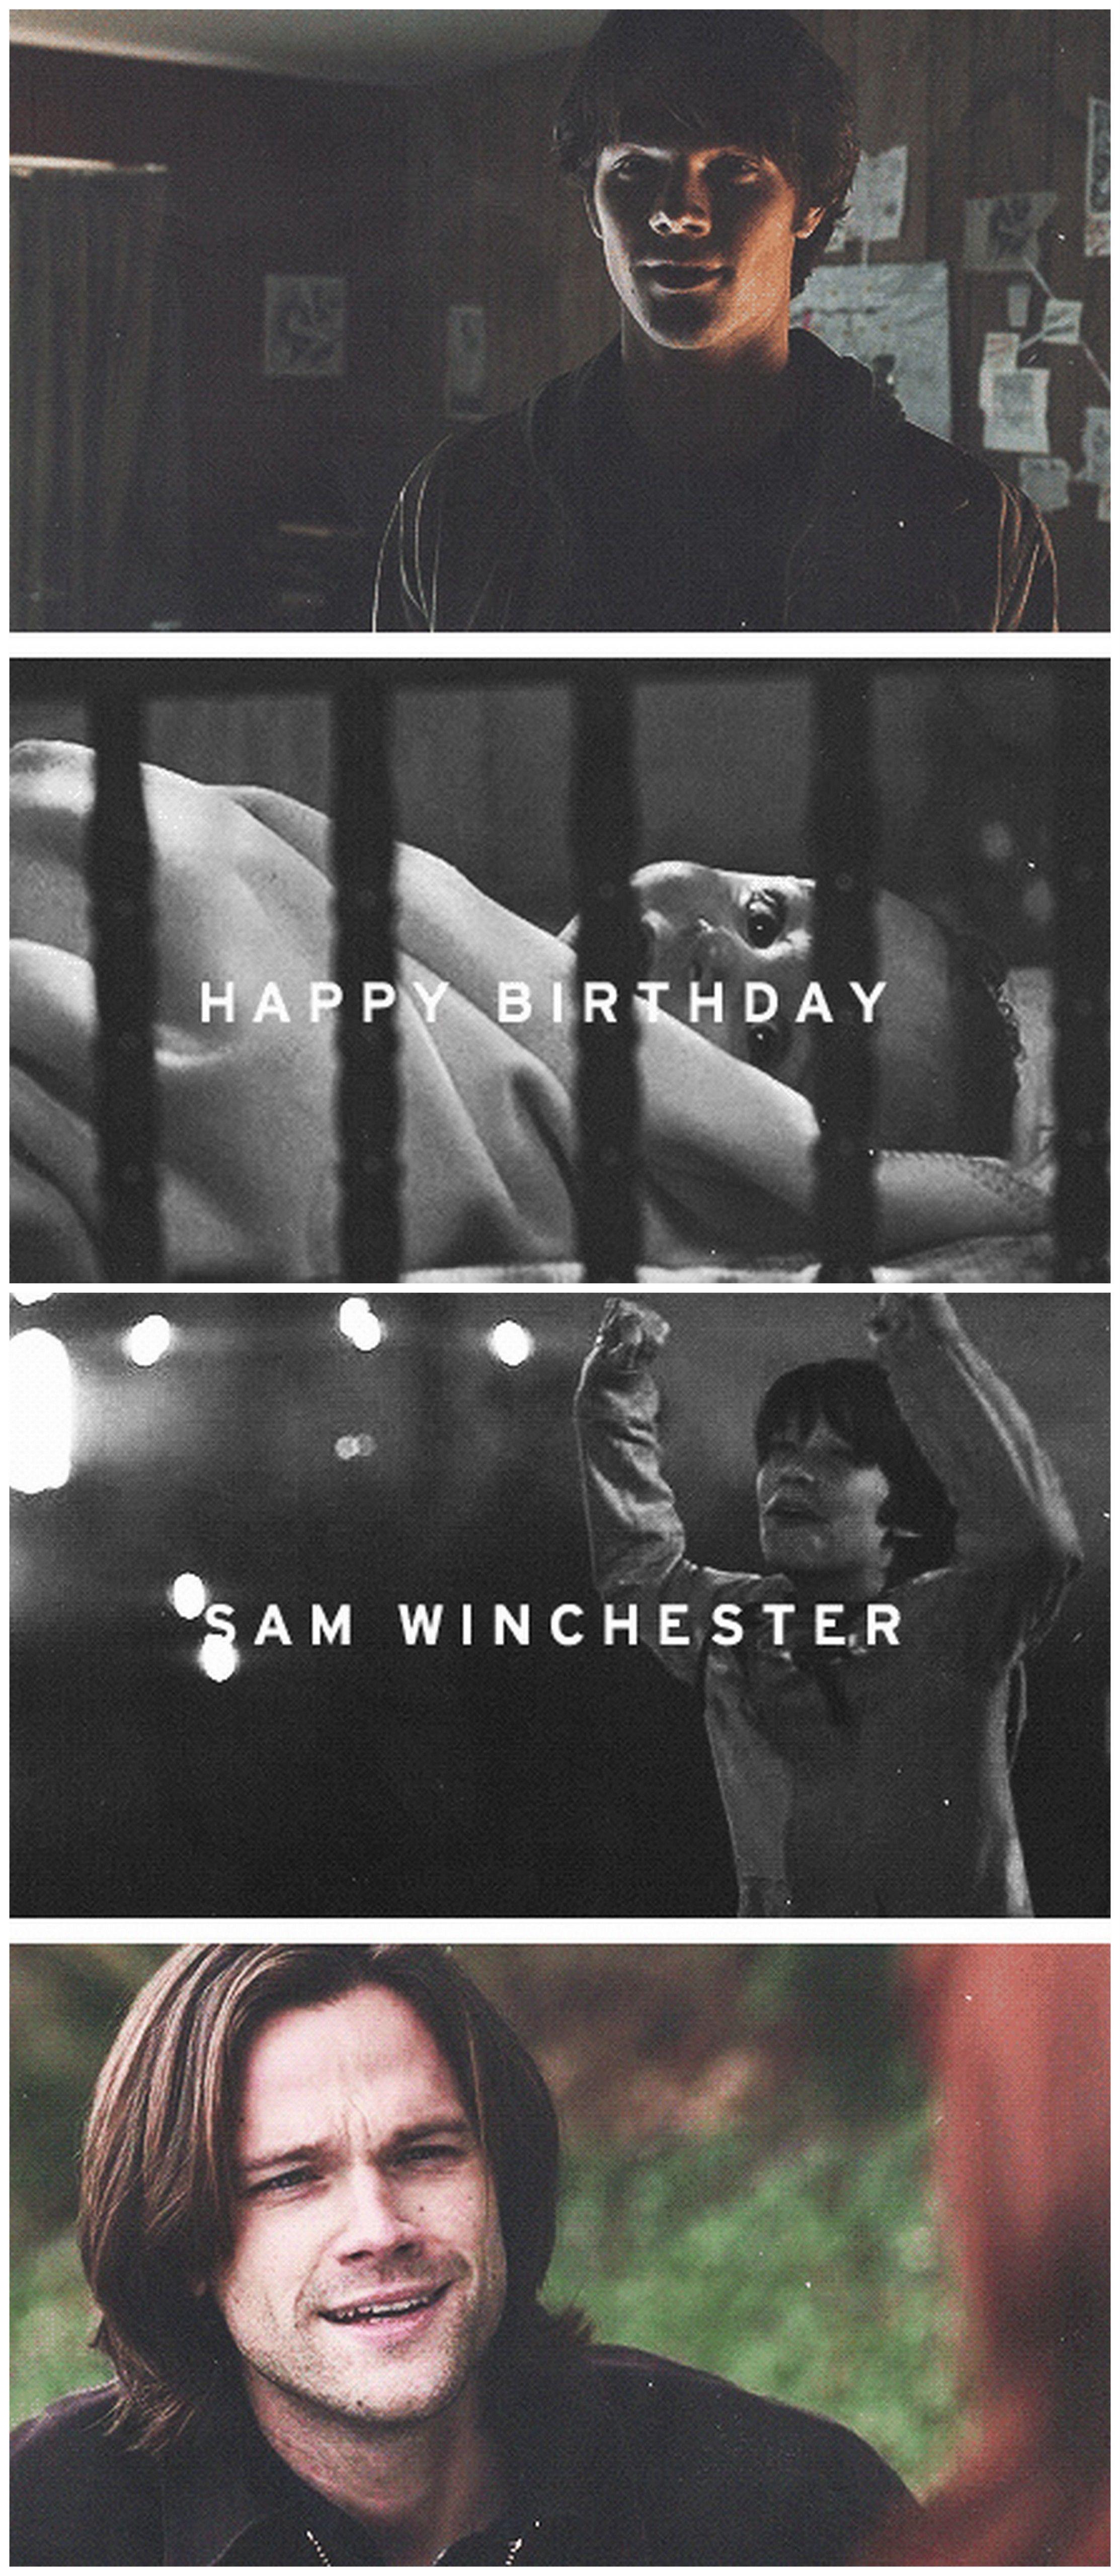 [gifset] ( May 2nd ) Happy birthday, Sam Winchester #SPN 1x01, 5x16, 8x20